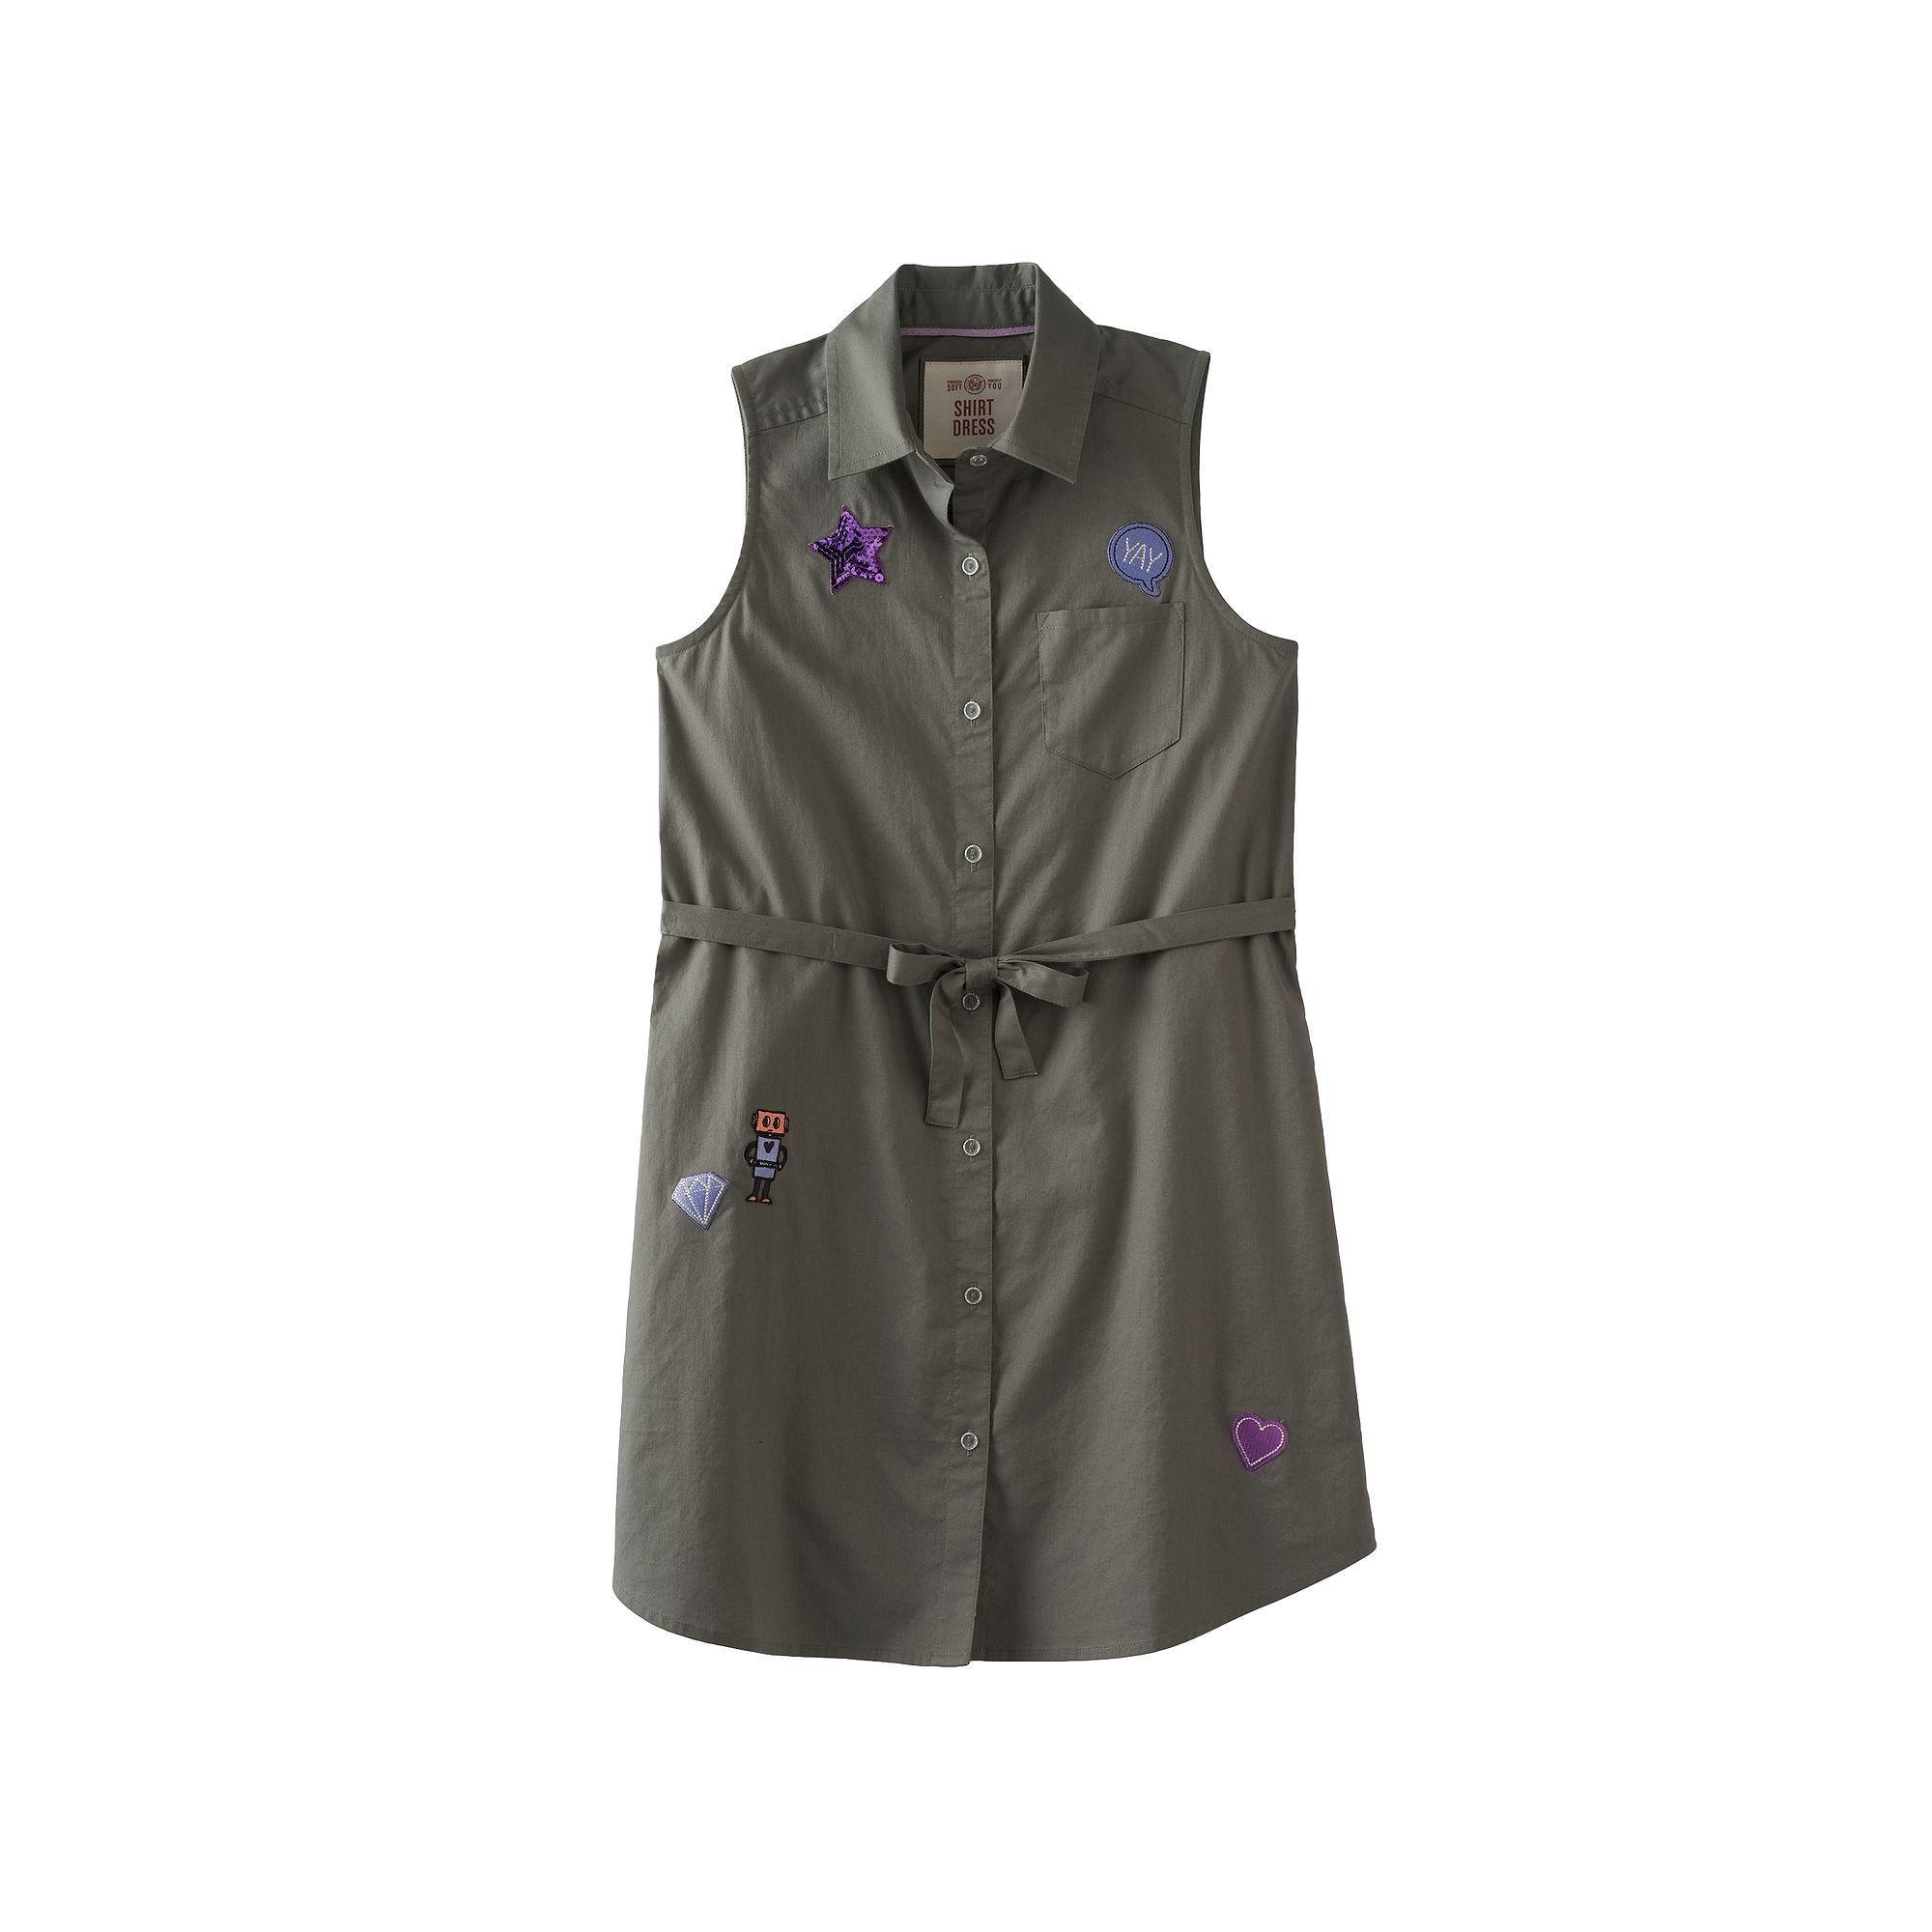 Girls u plus size soolive sleeveless patch applique shirt